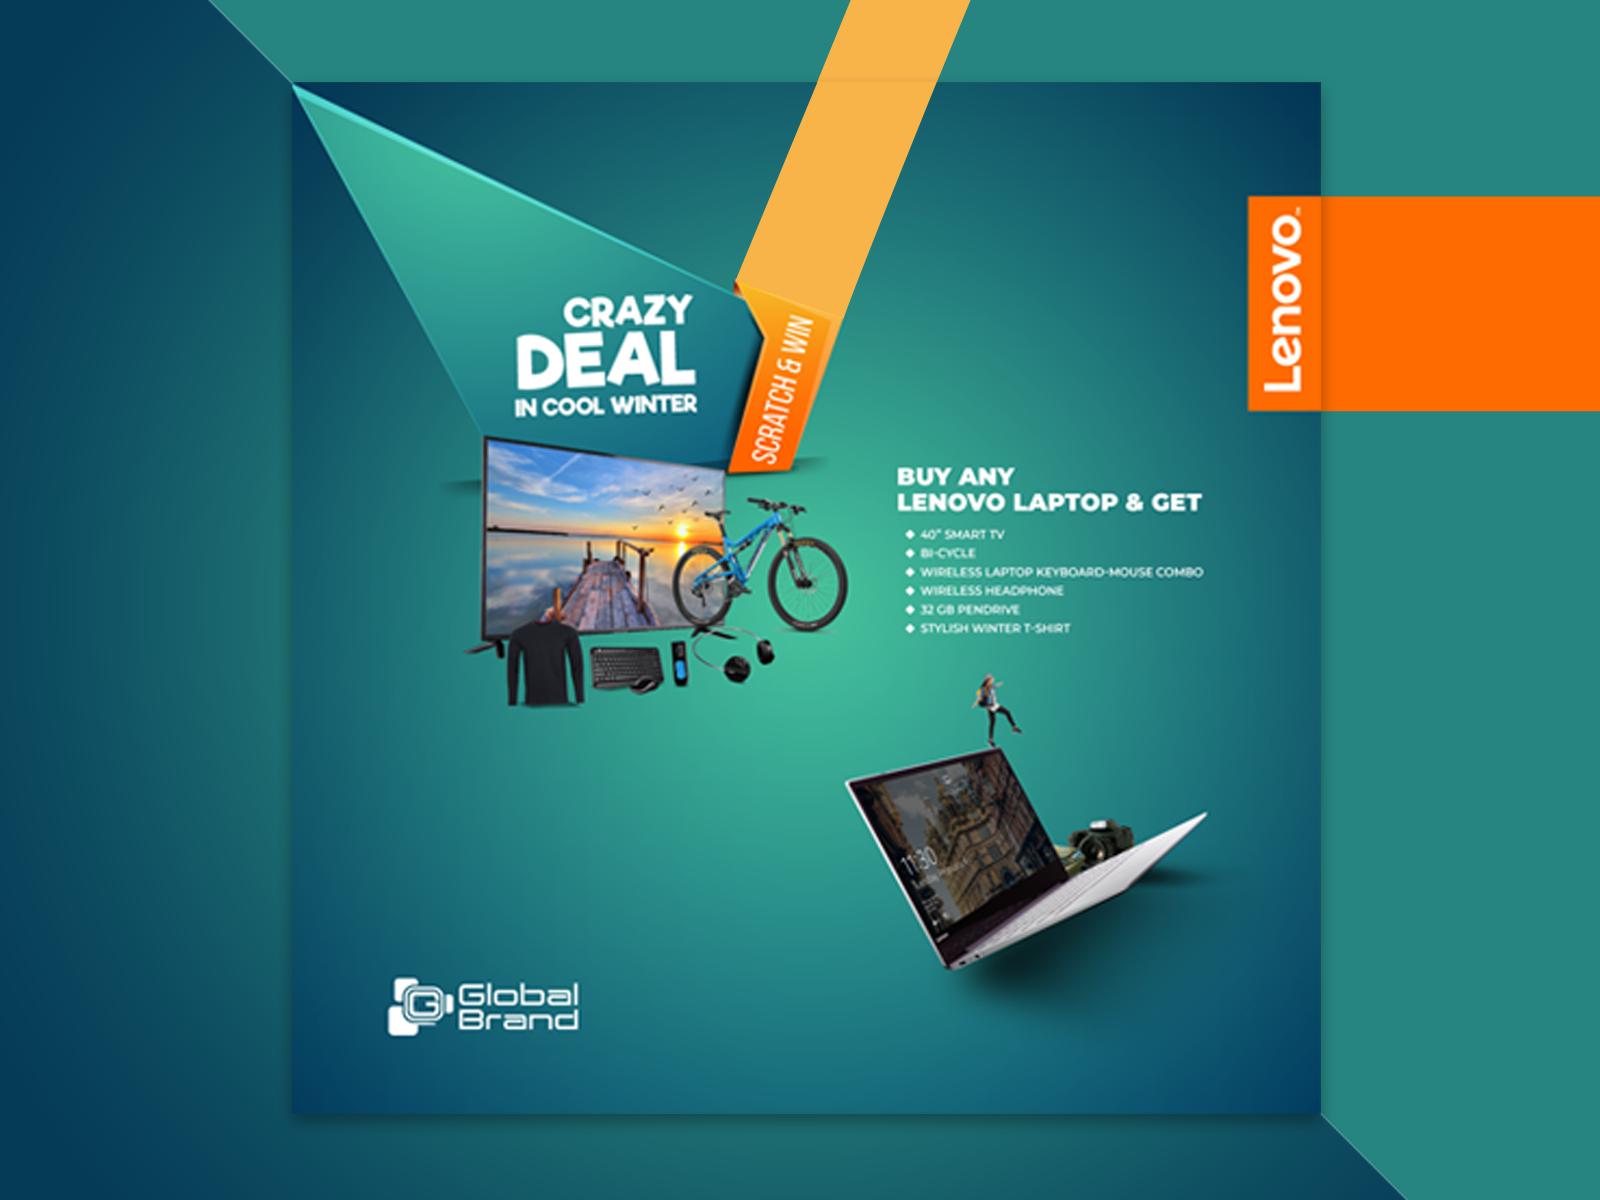 Lenovo Social Media Advertising Design By Rakibul Islam On Dribbble